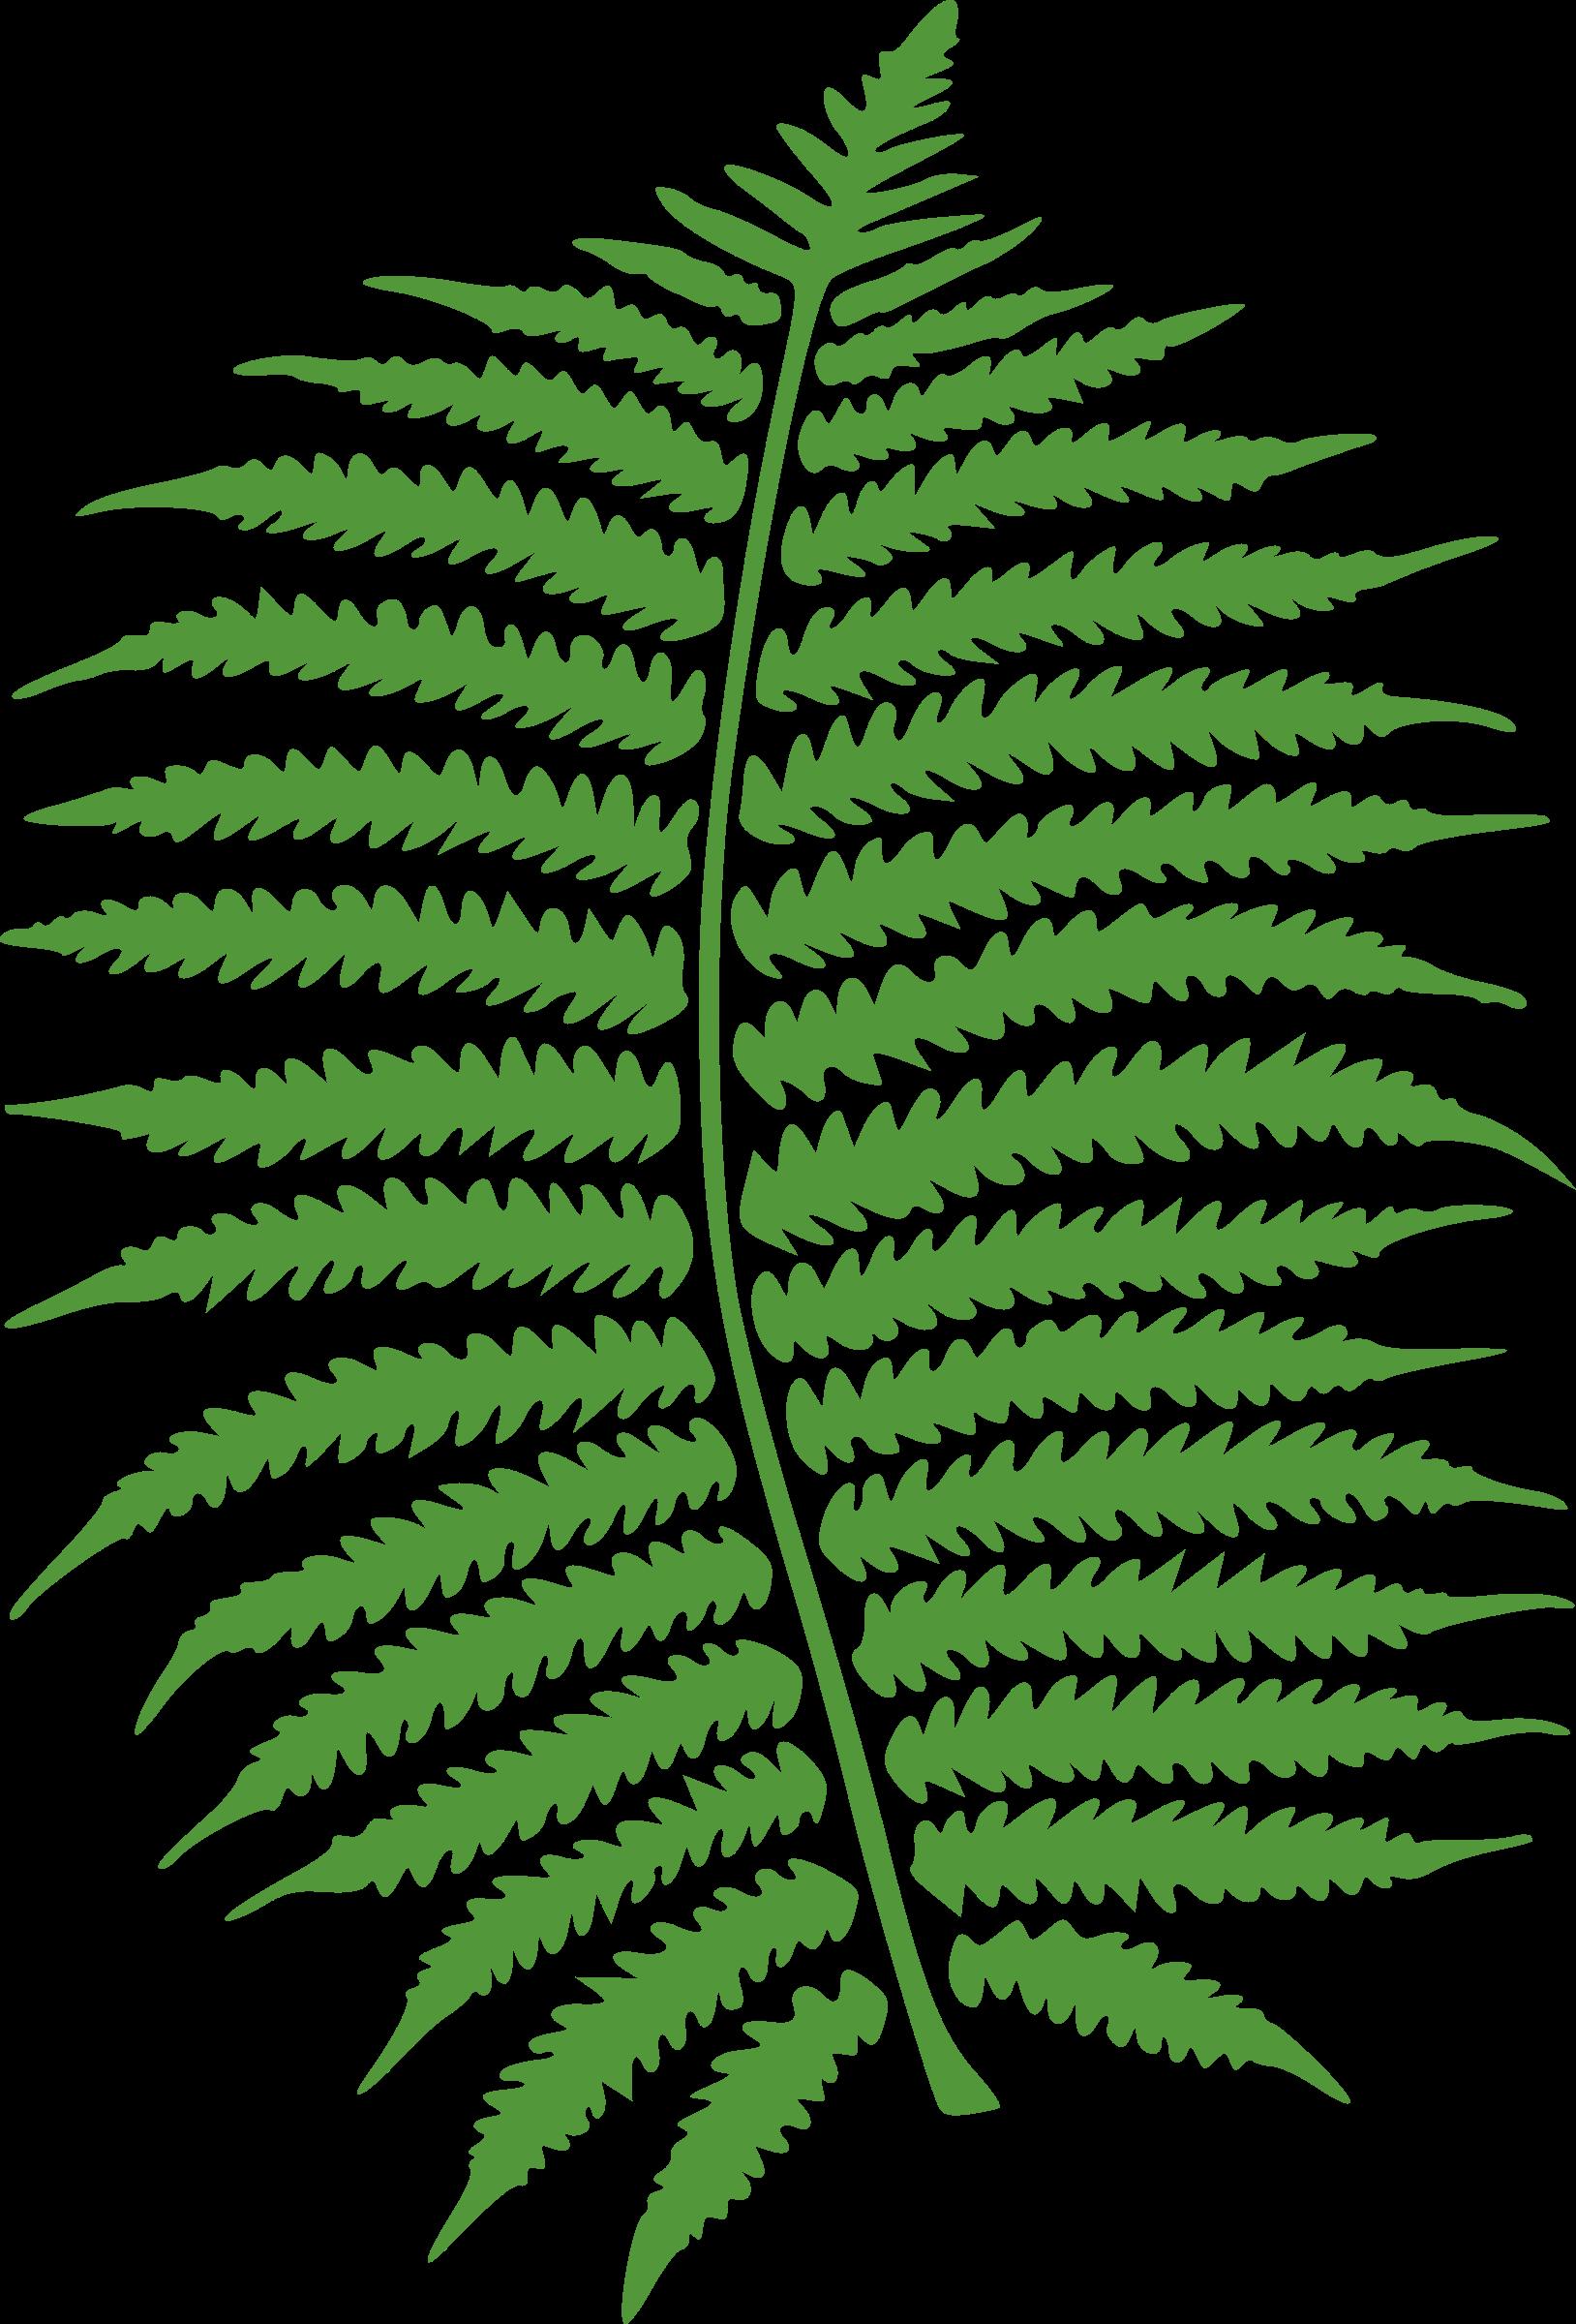 Big image png. Clipart leaves fern